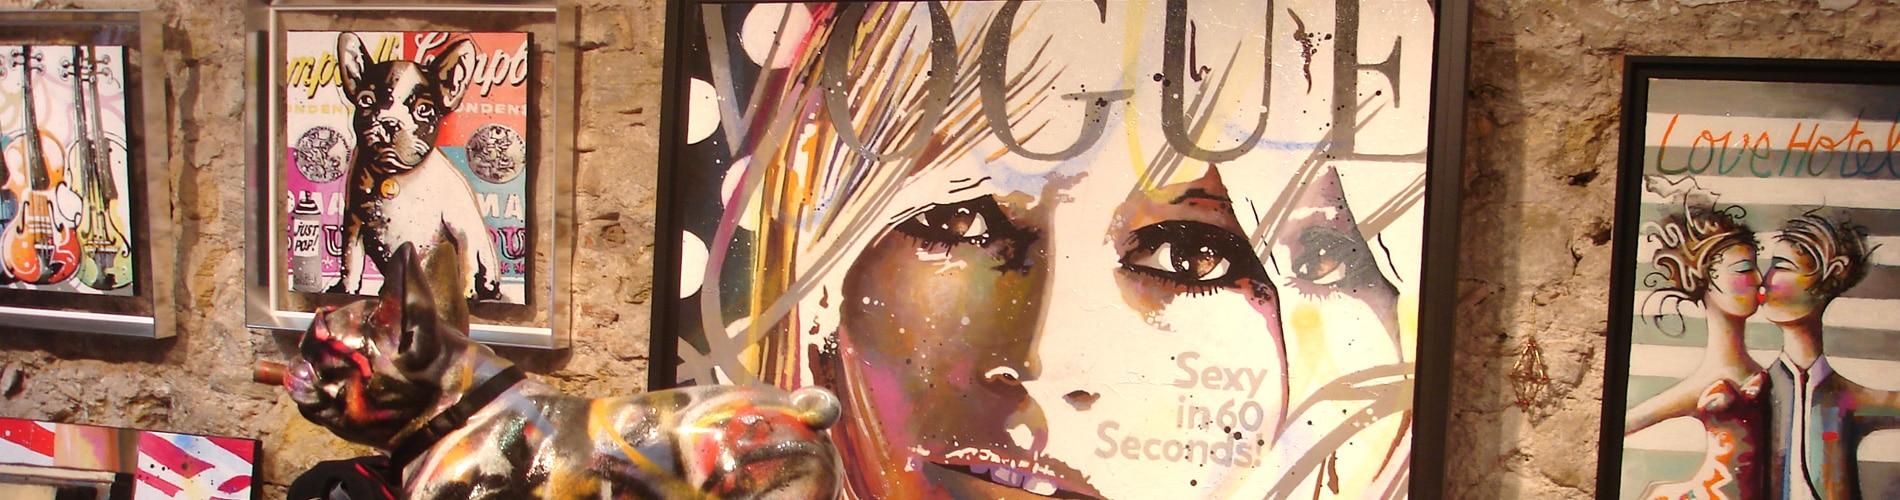 La galerie Cornee Gallery, peintures et tableaux pop art en ligne